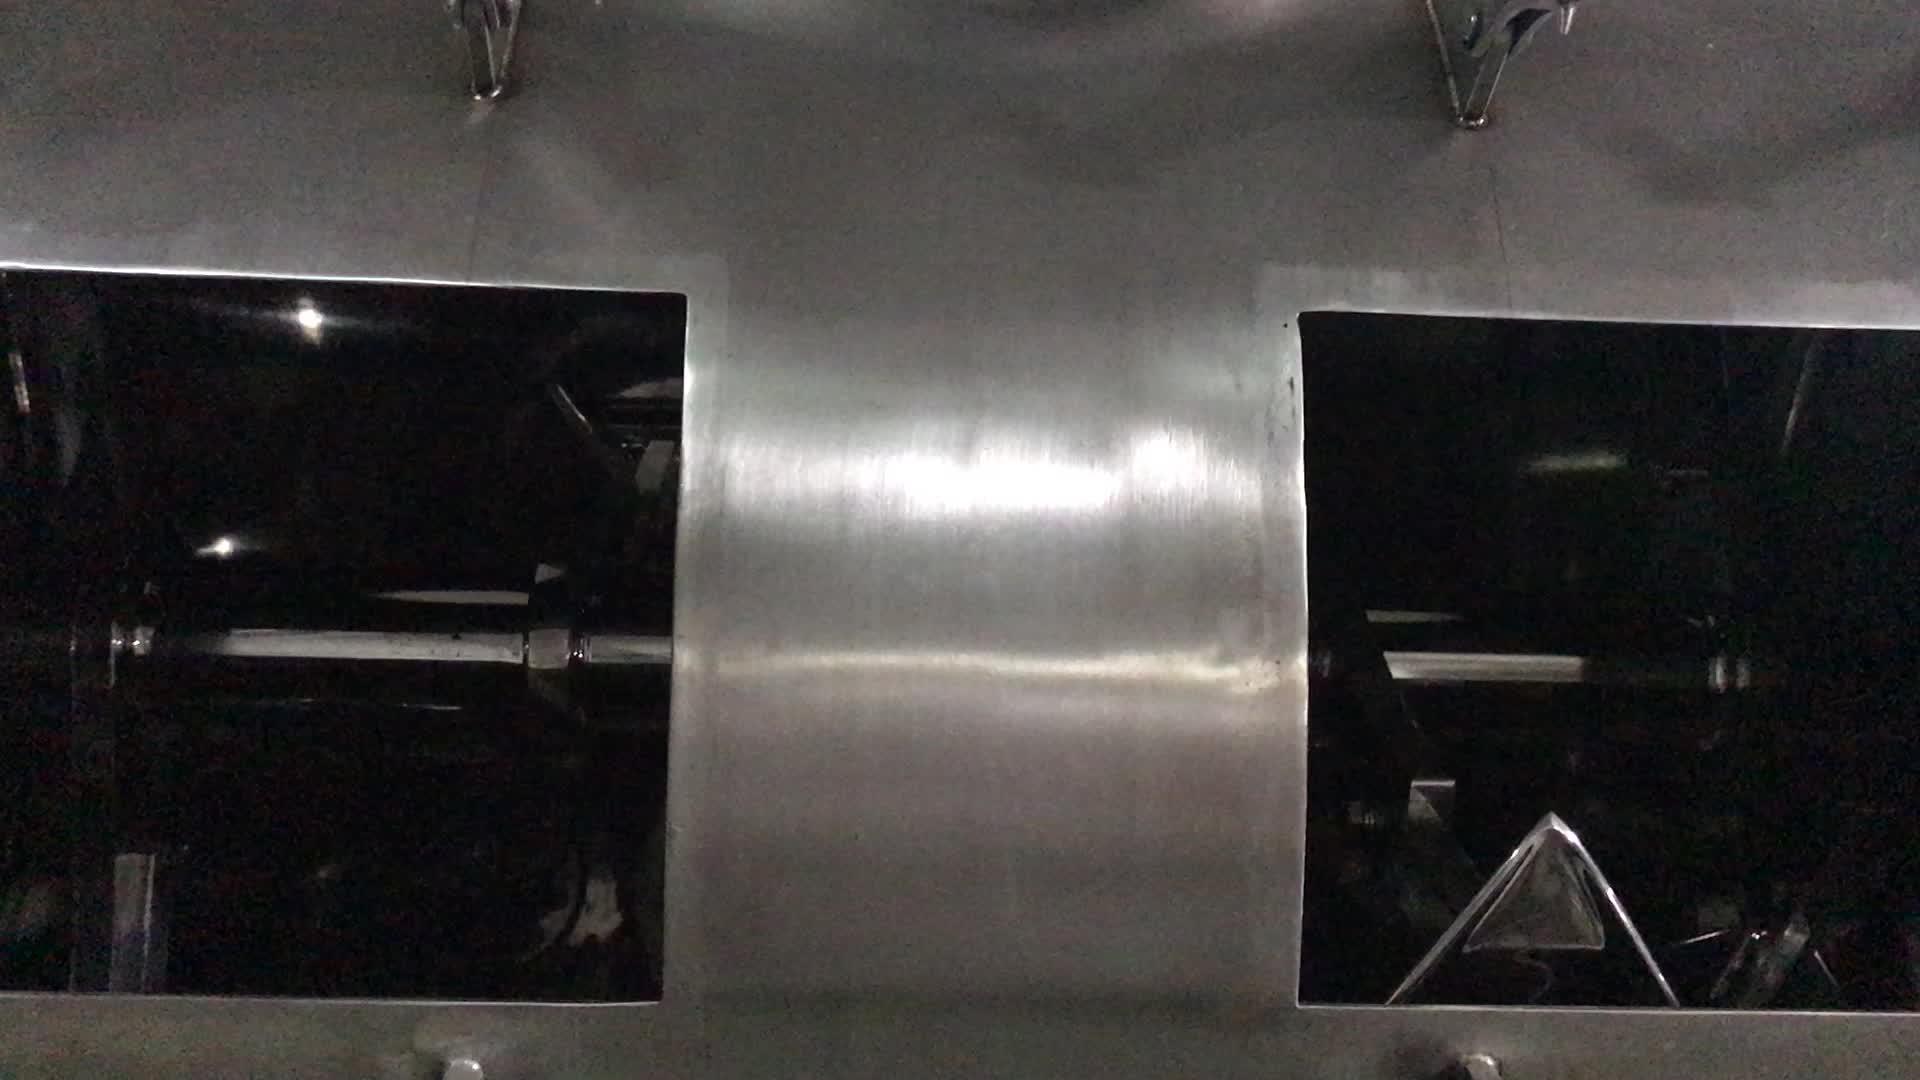 Industrial Plough Shear Mixer/Mixer Machine for Powder